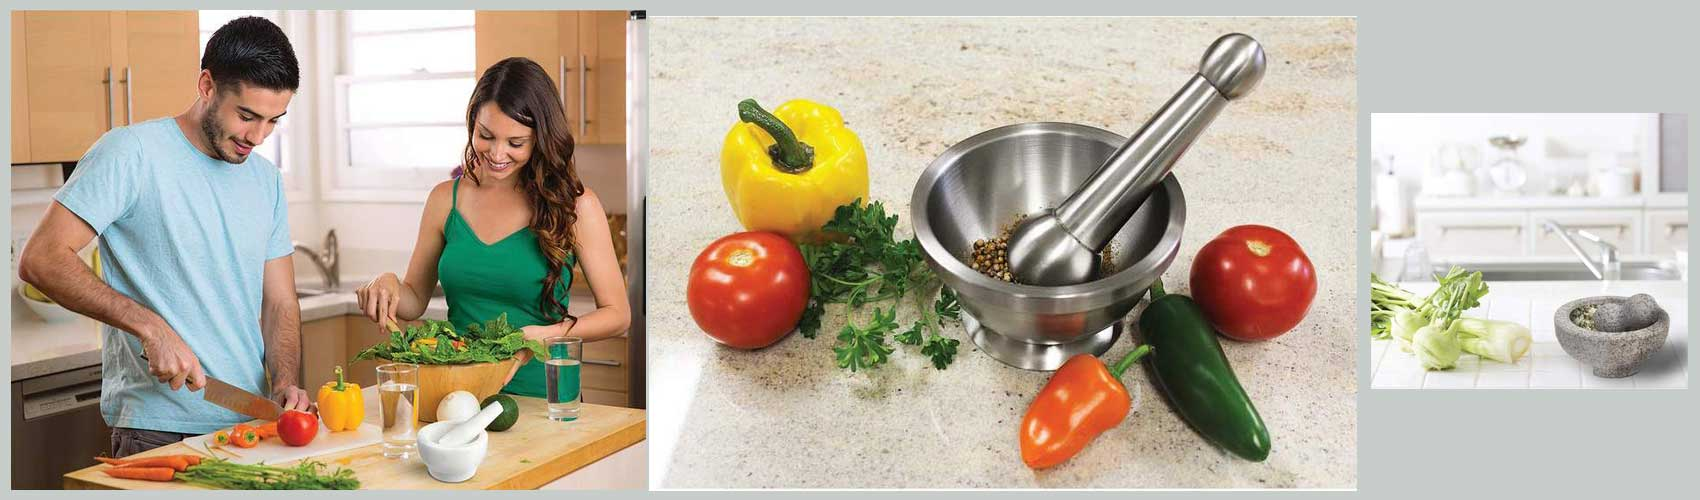 kitchen-mortar-pestle